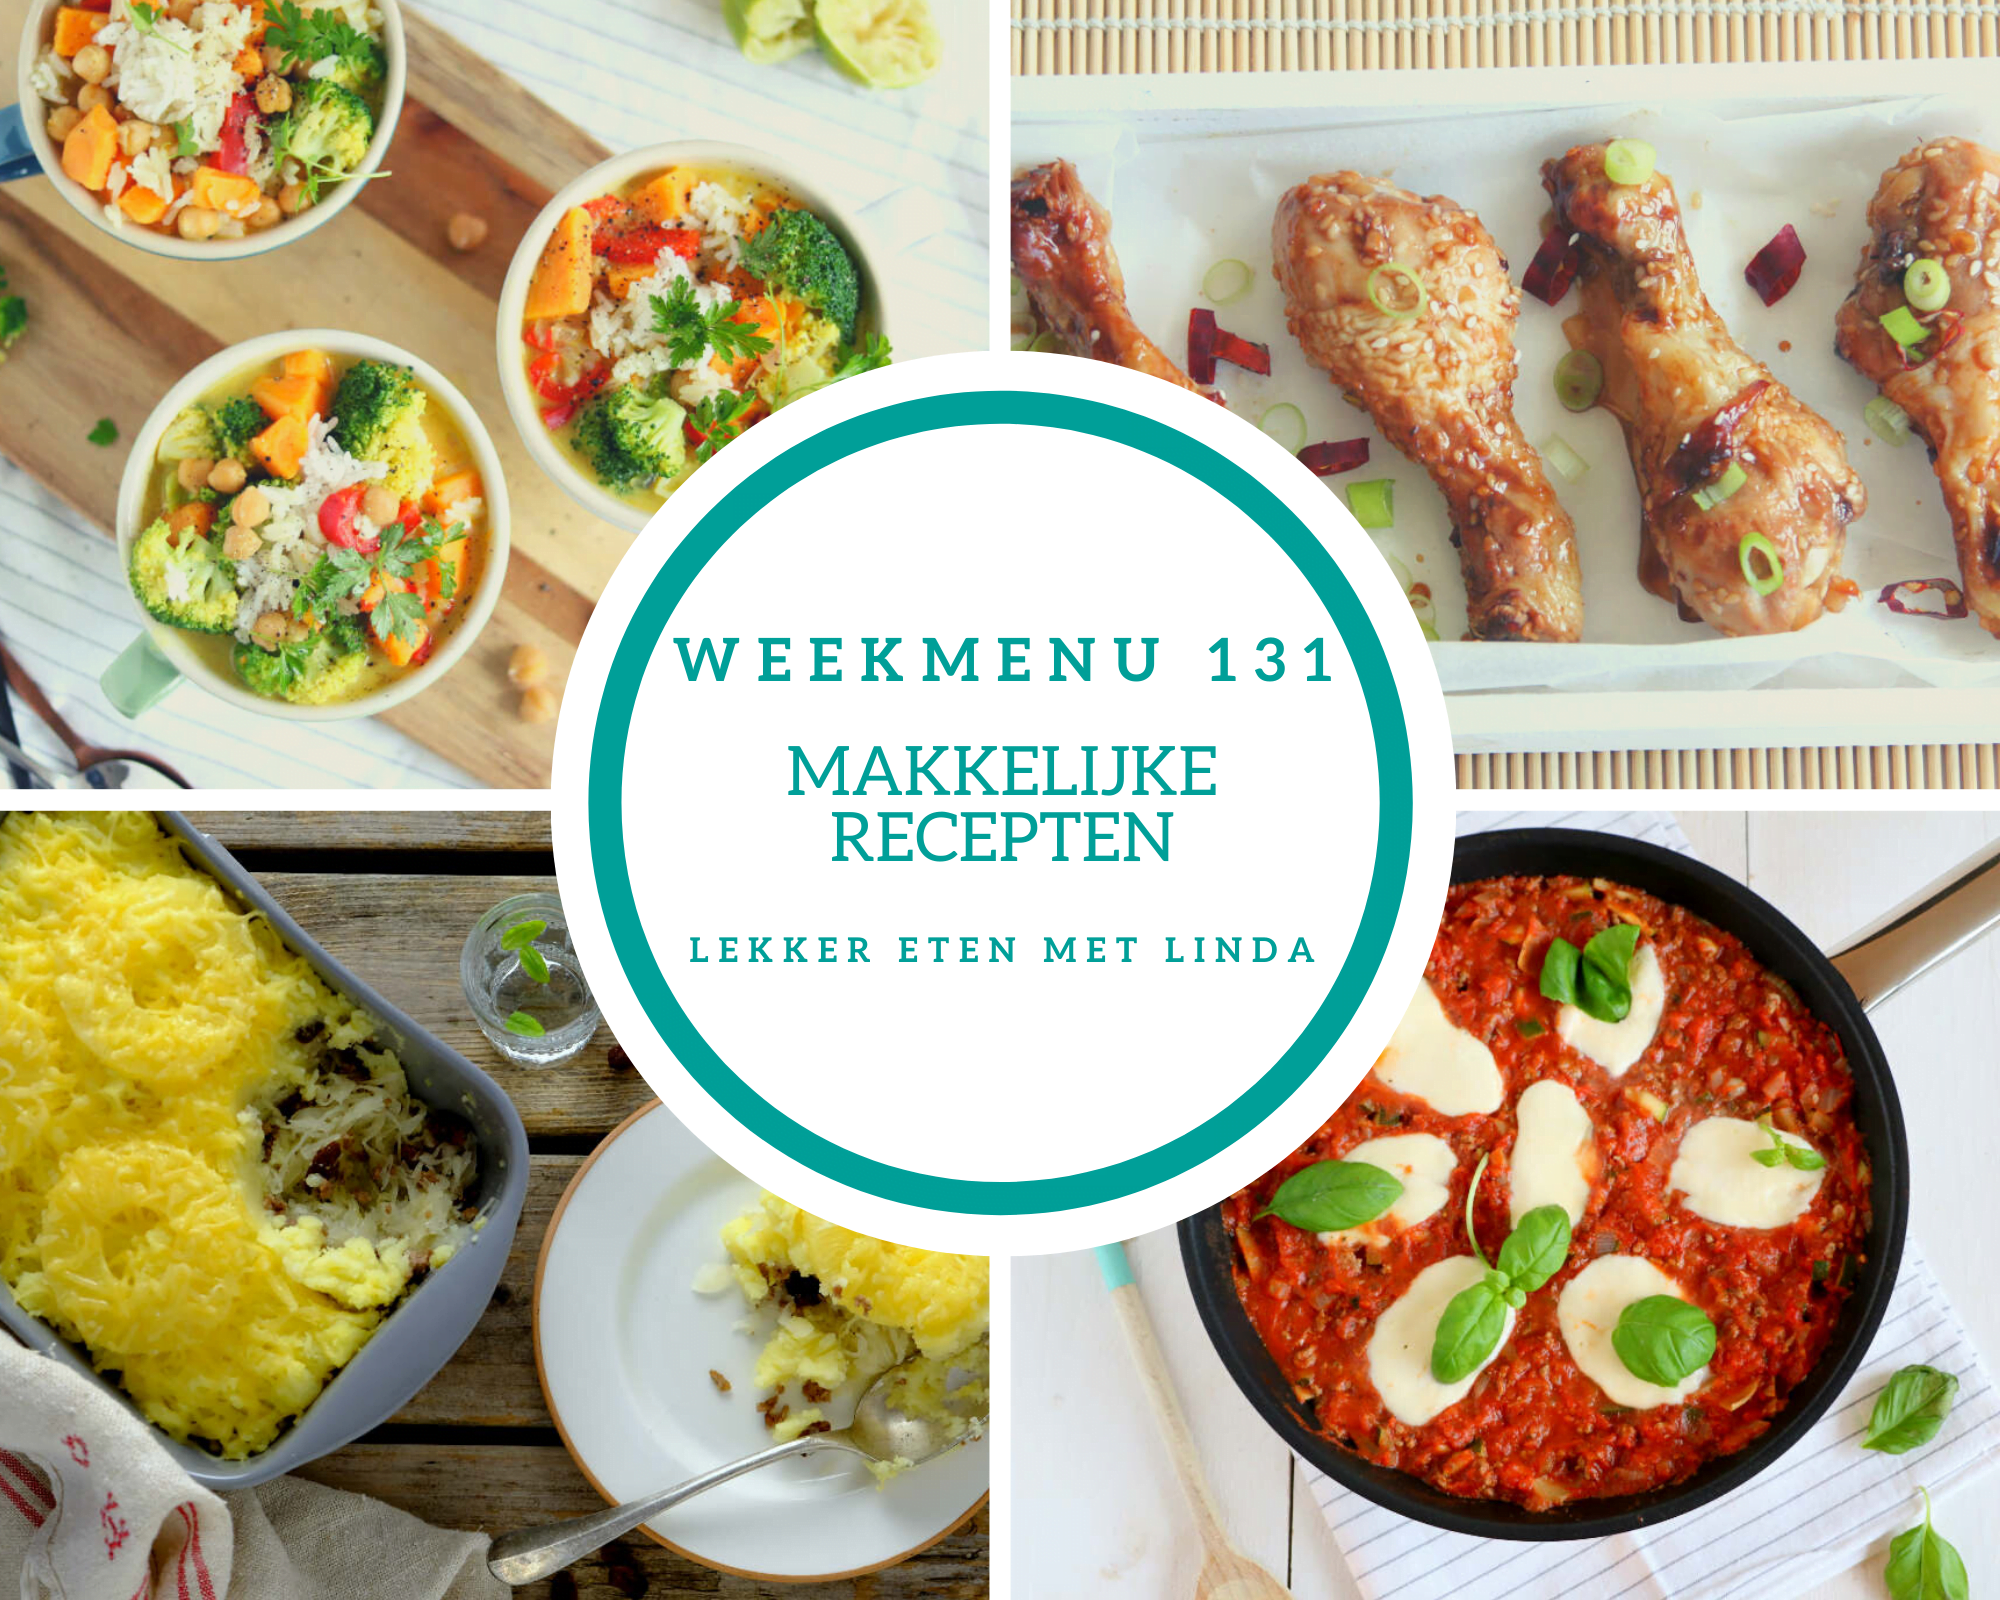 Weekmenu 131 makkelijke recepten